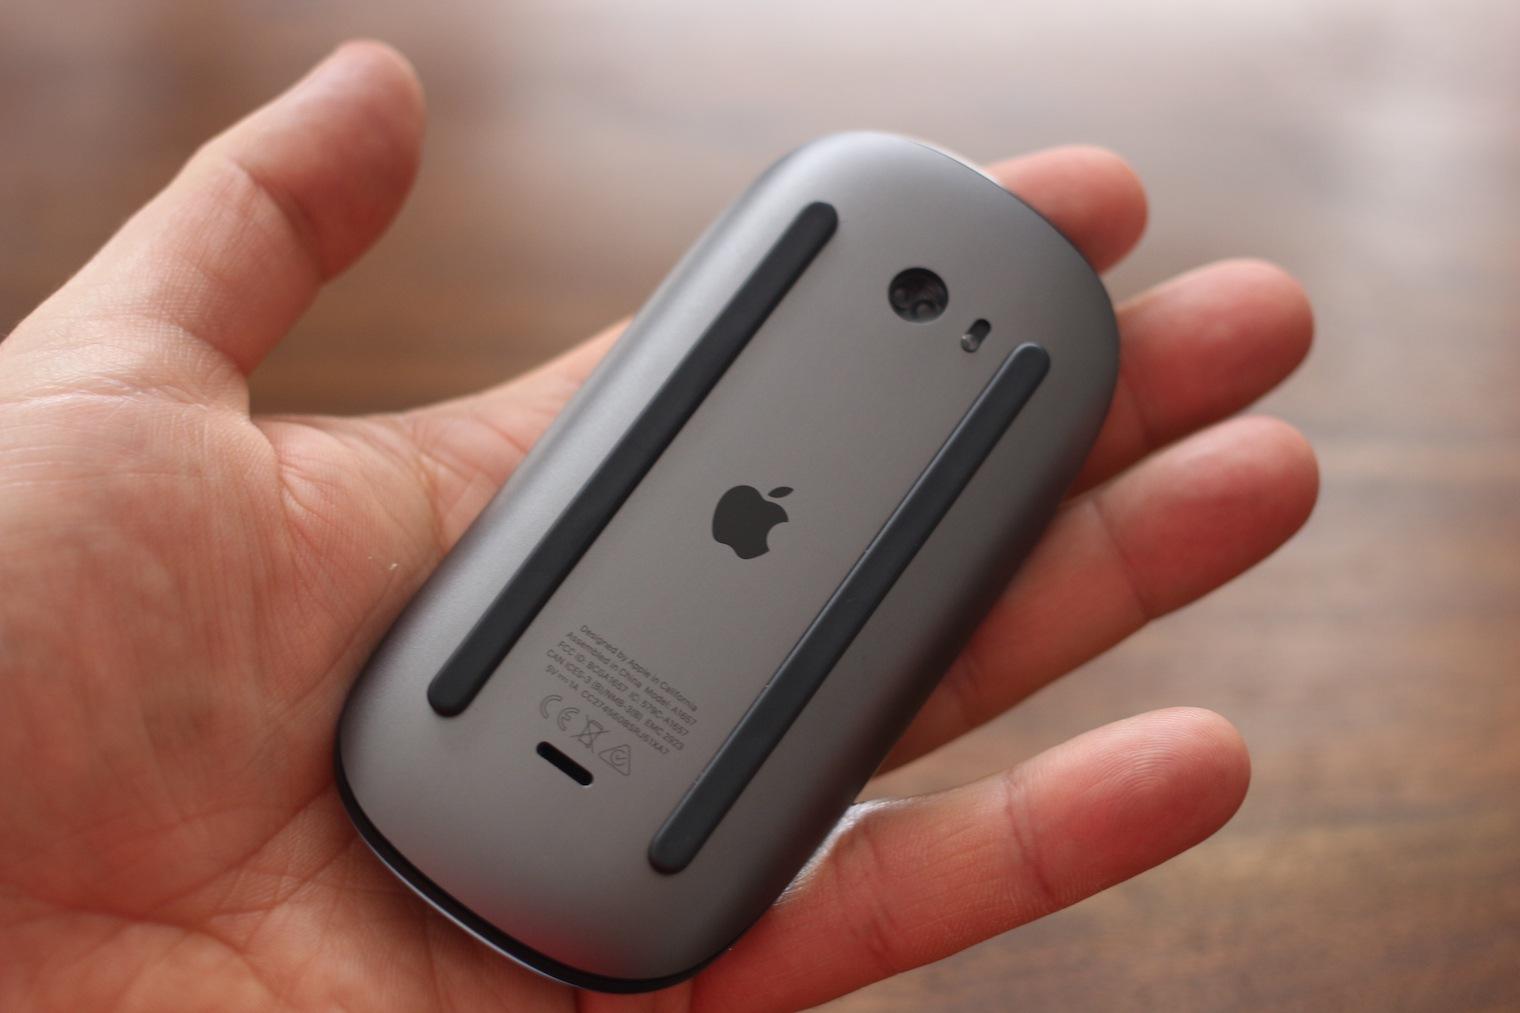 iMac Pro Mouse